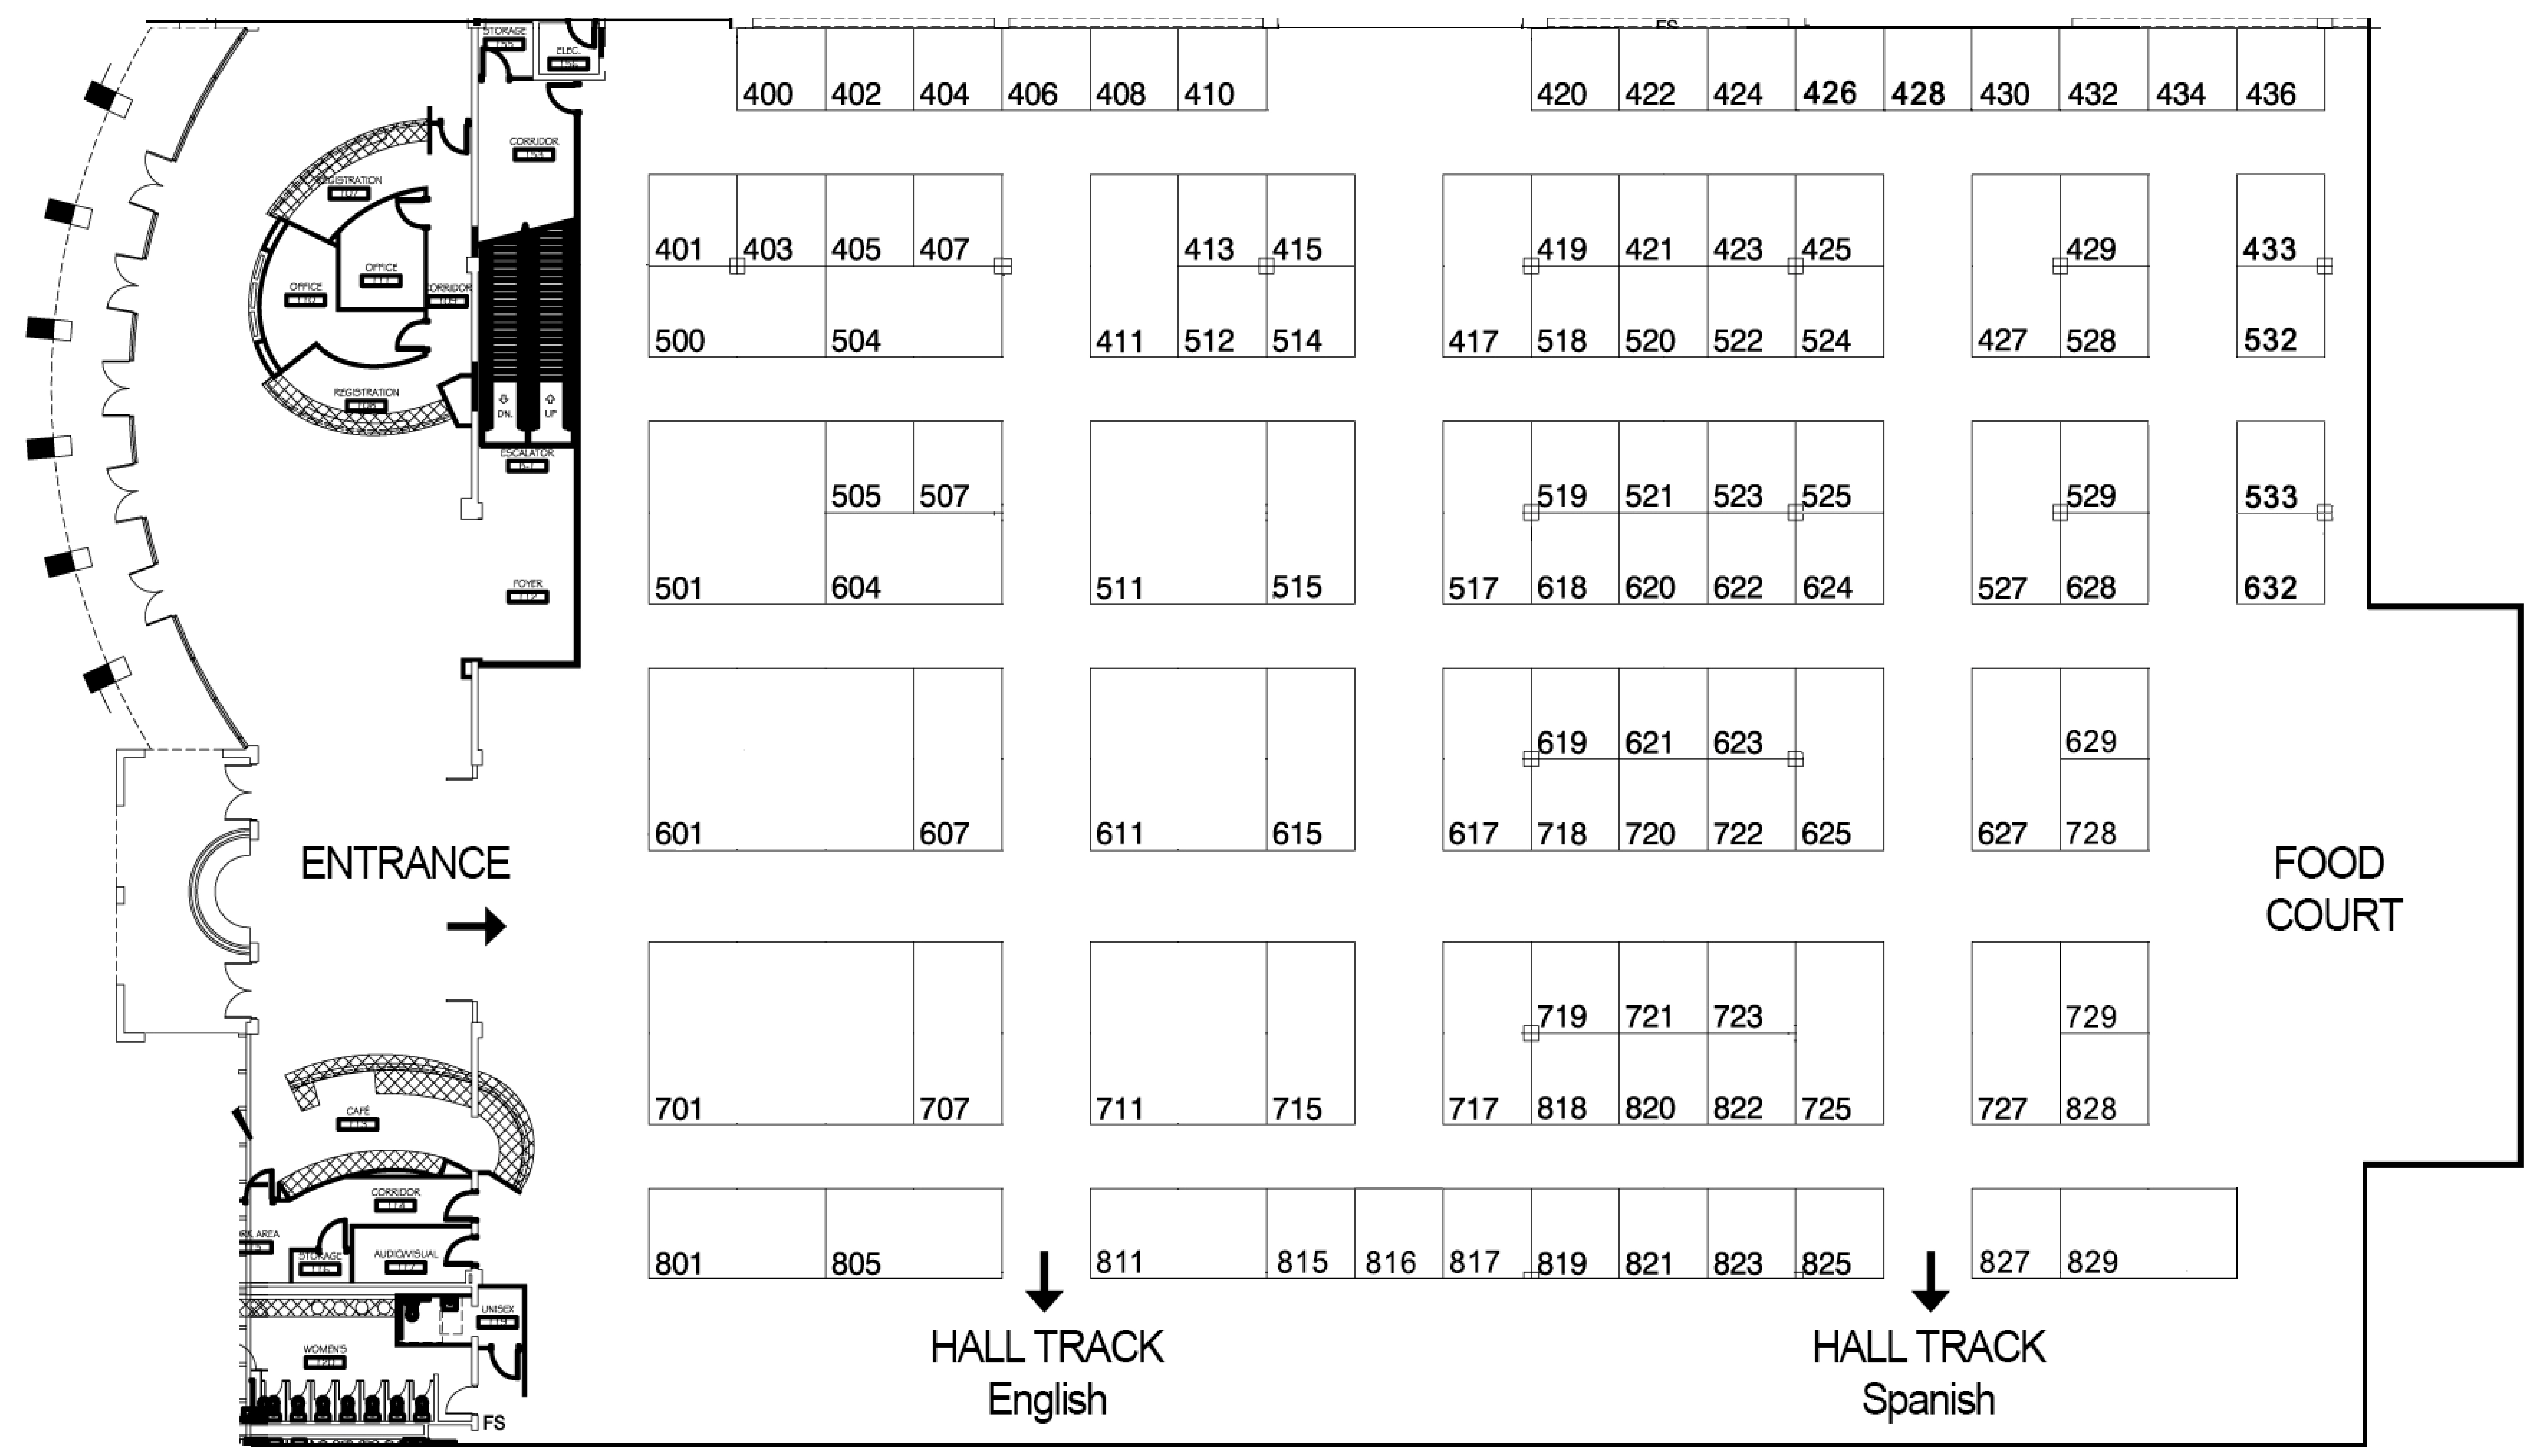 Office decor ideas for auto dealer joy studio design for Floor plan agreement